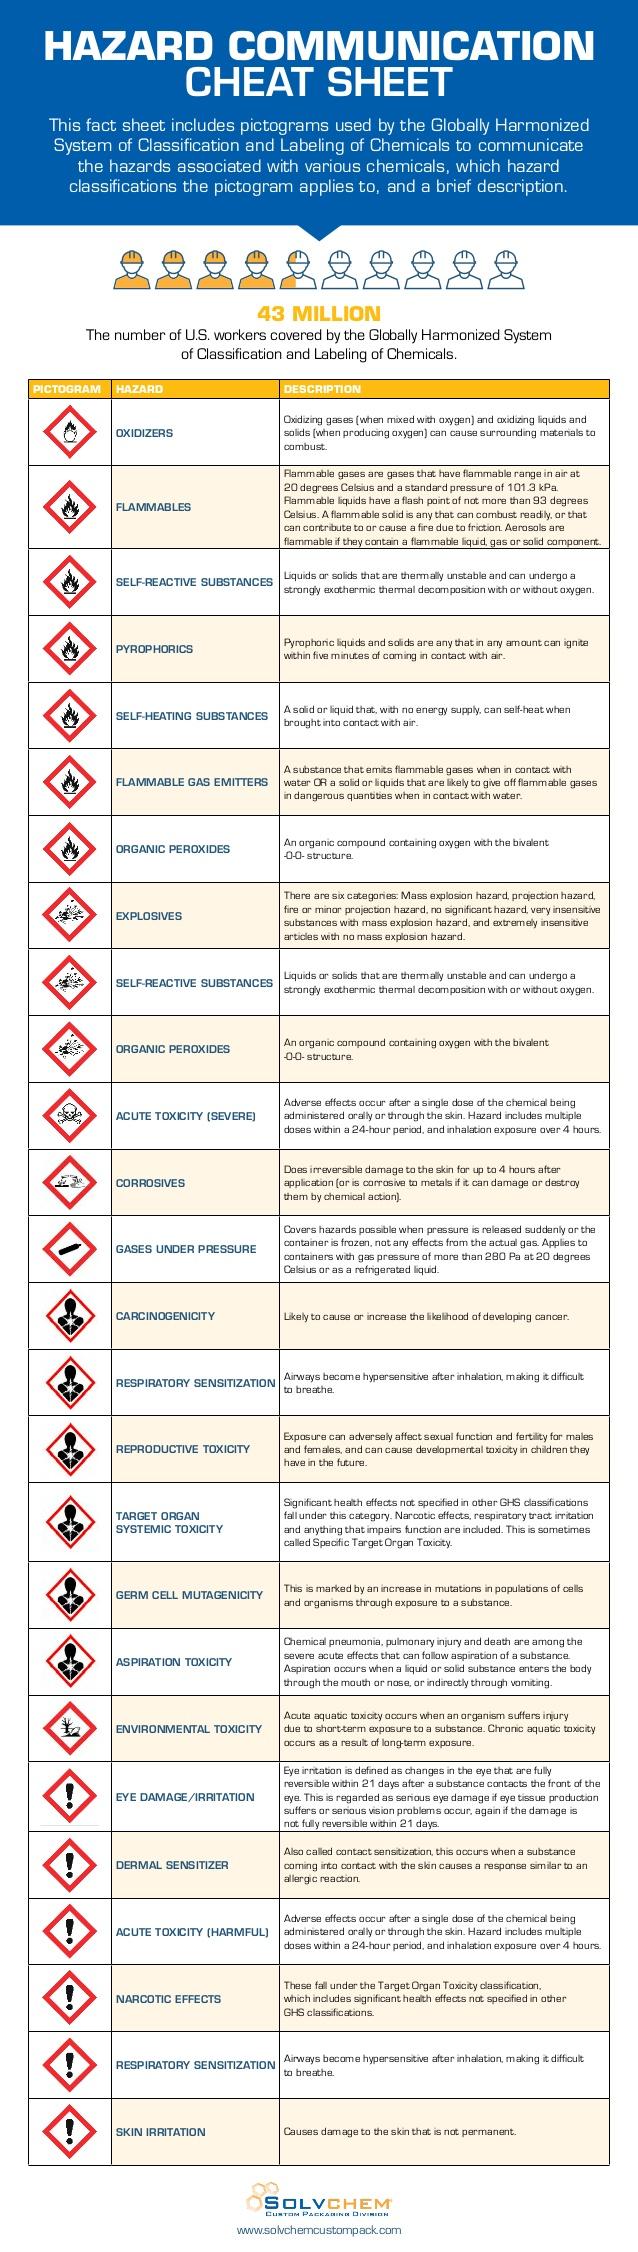 hazard-communication-cheat-sheet-1-638